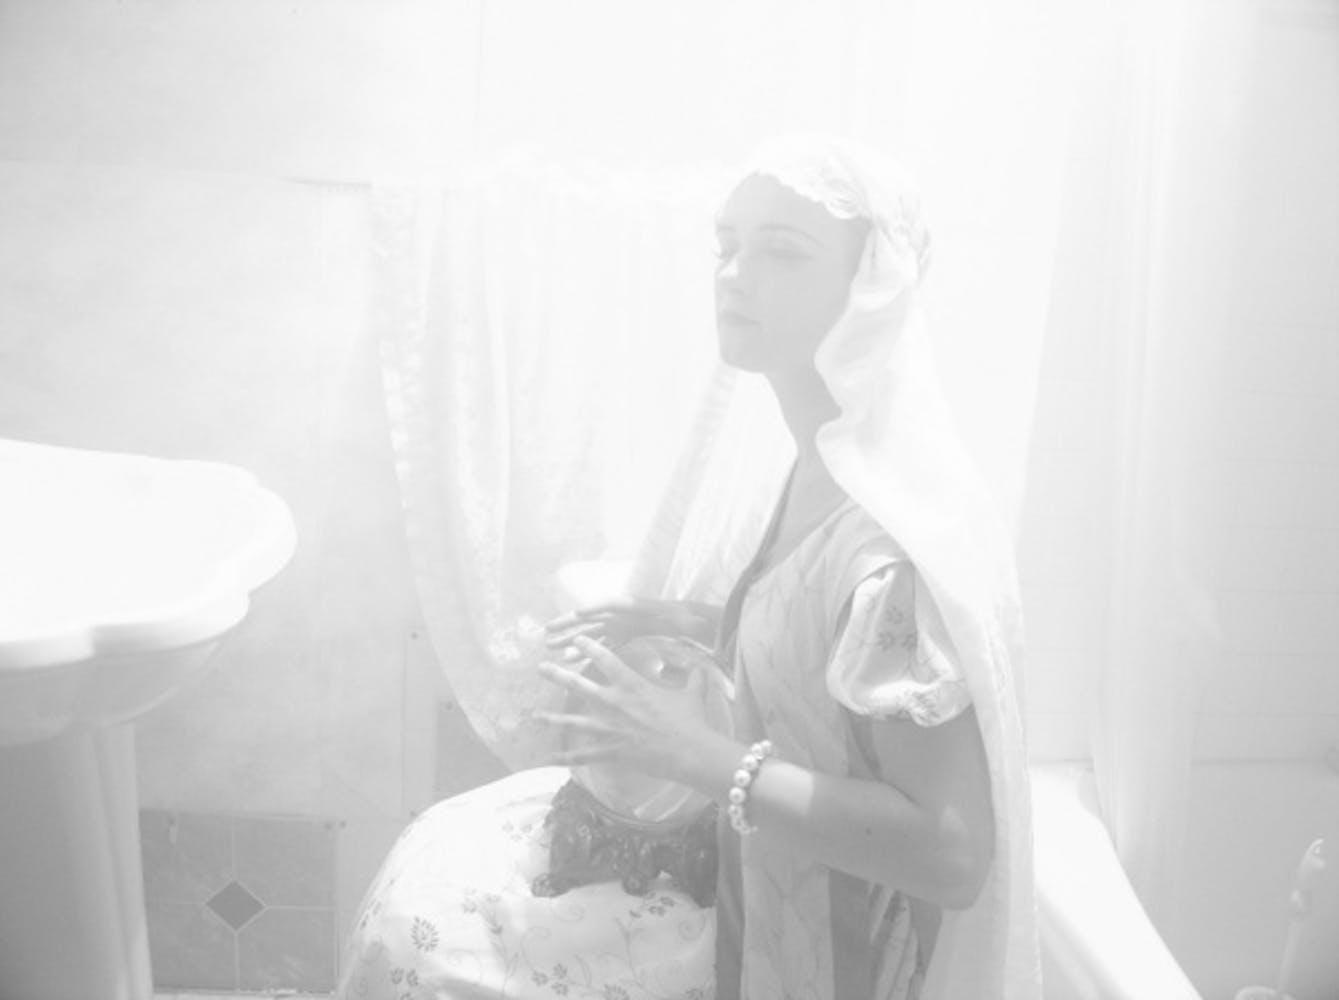 Catherine Sullivan, Triangle of Need, 2007